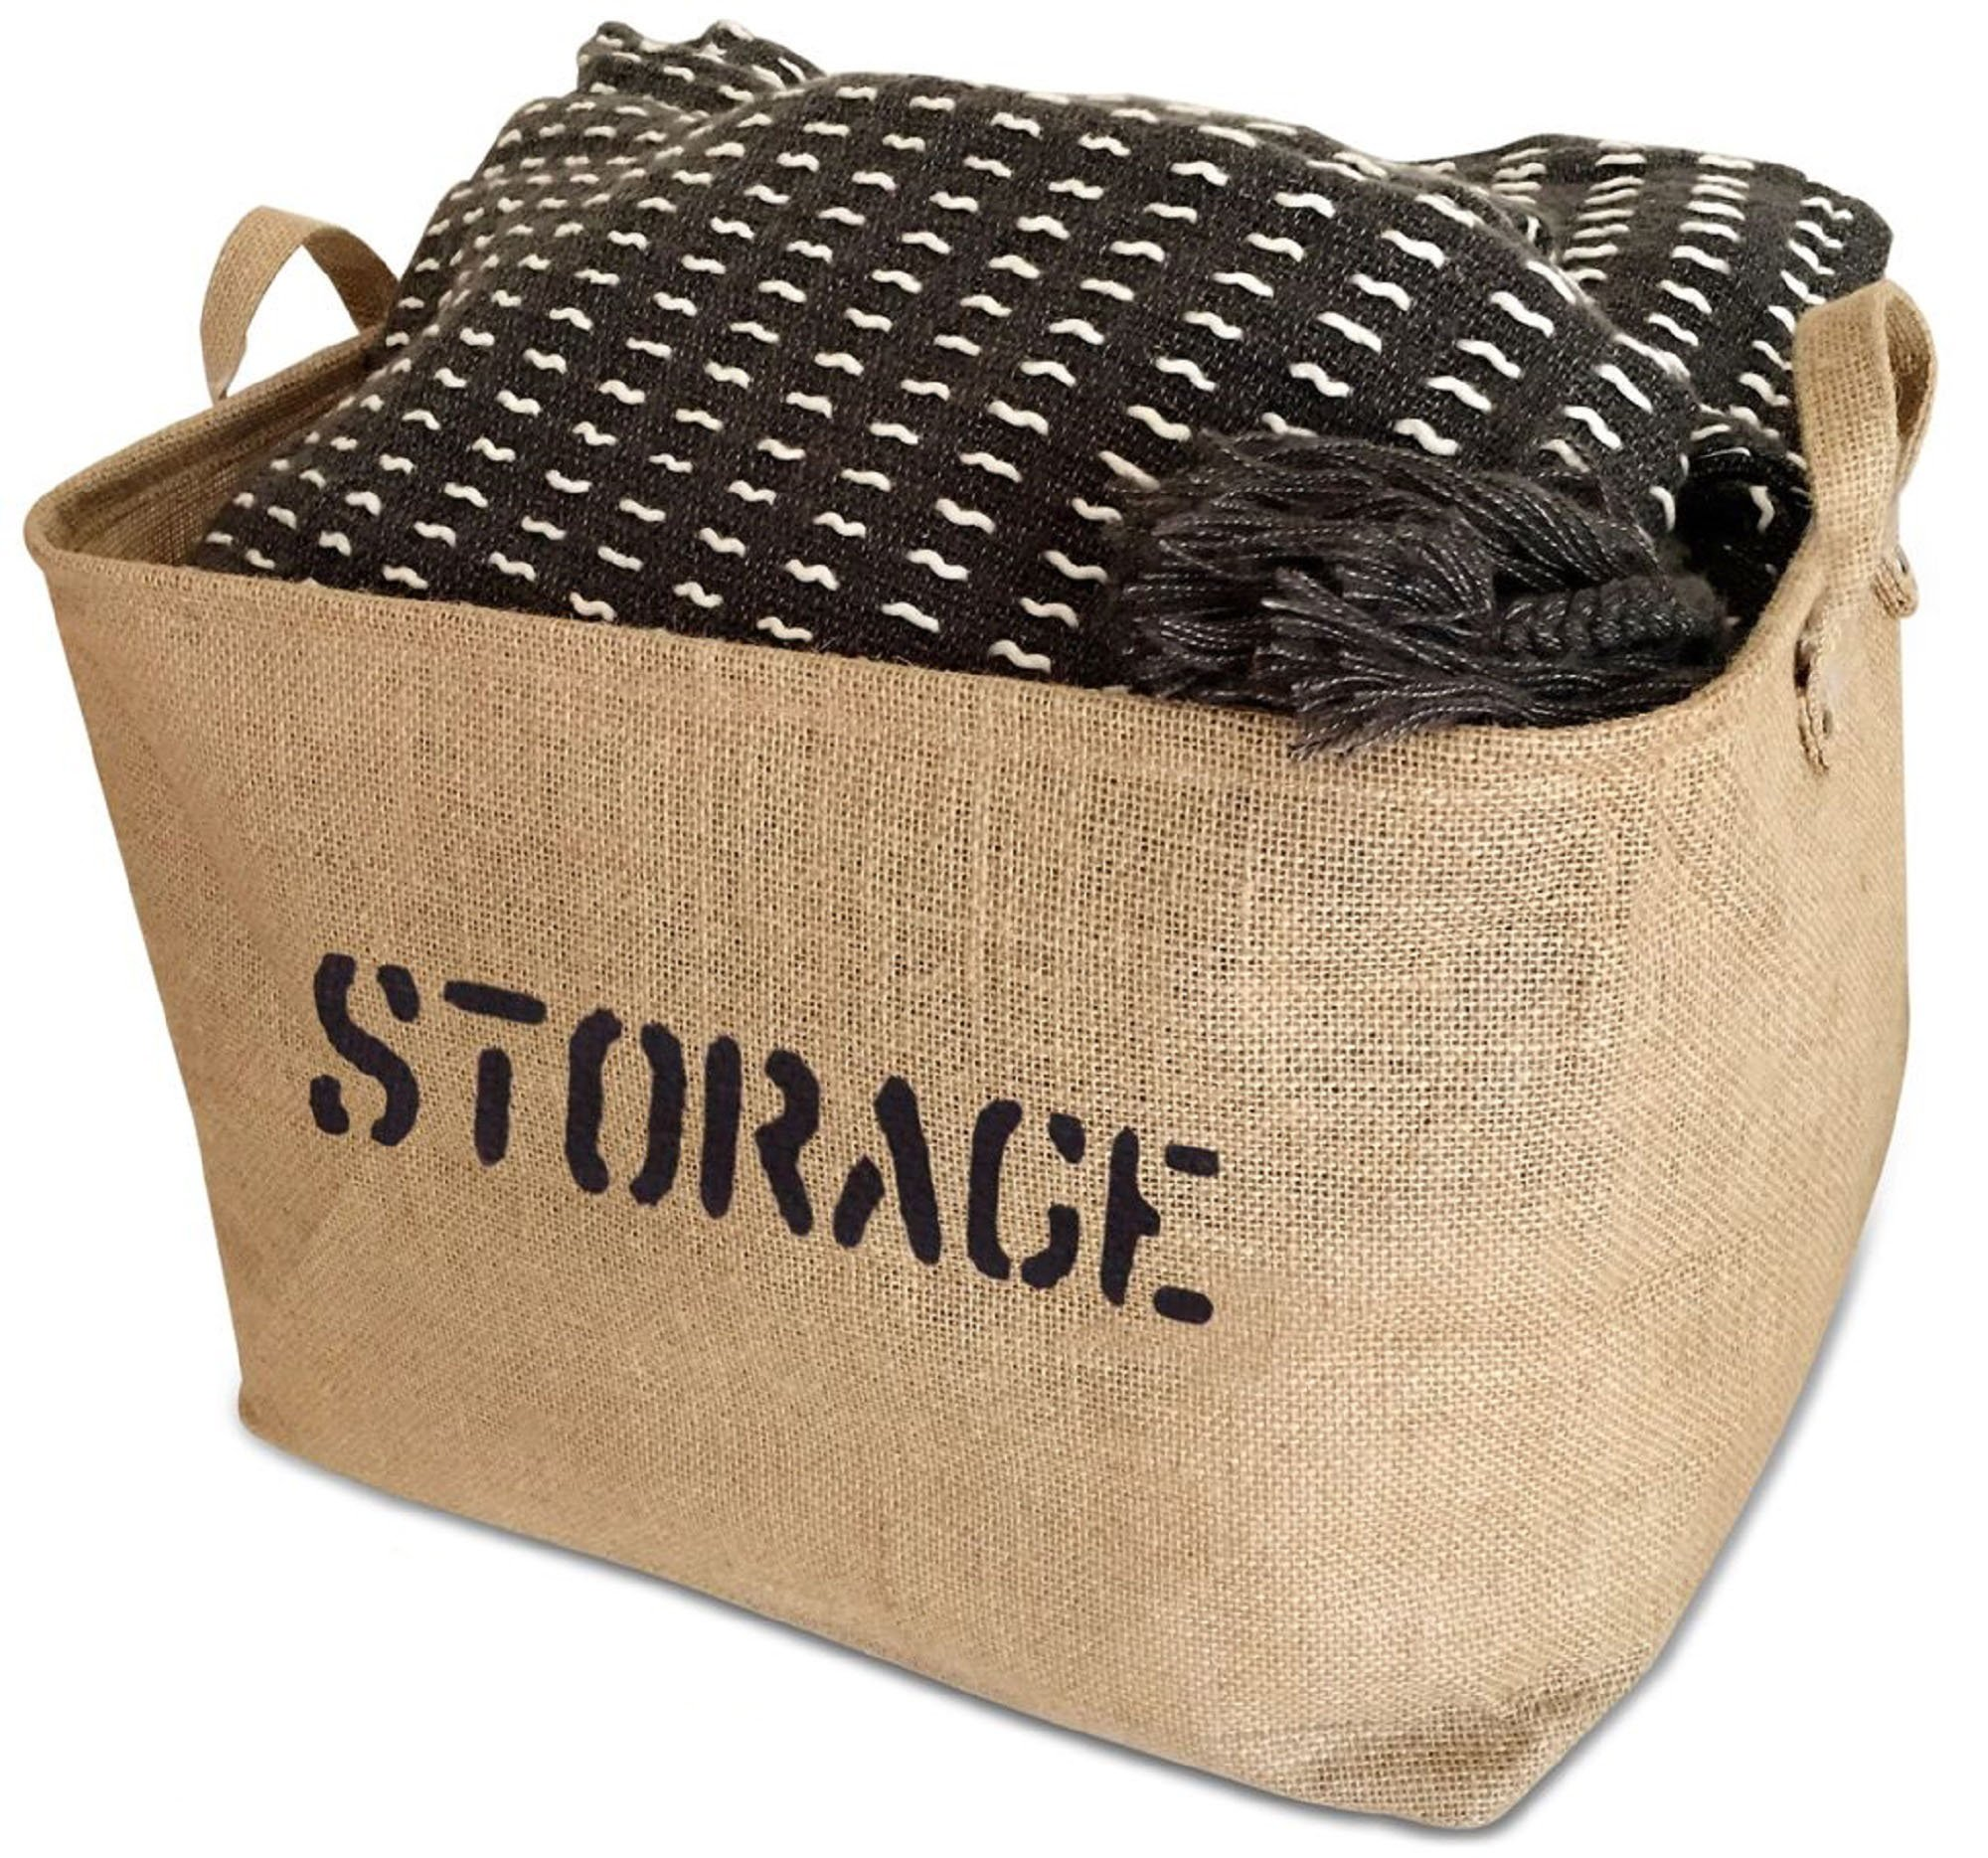 OrganizerLogic Burlap Storage Organizer Basket - Heavy Duty Storage Basket - Perfect Storage Jute Basket For Laundry, Shoes and Kids Toys - 17'' x 13'' x 10''